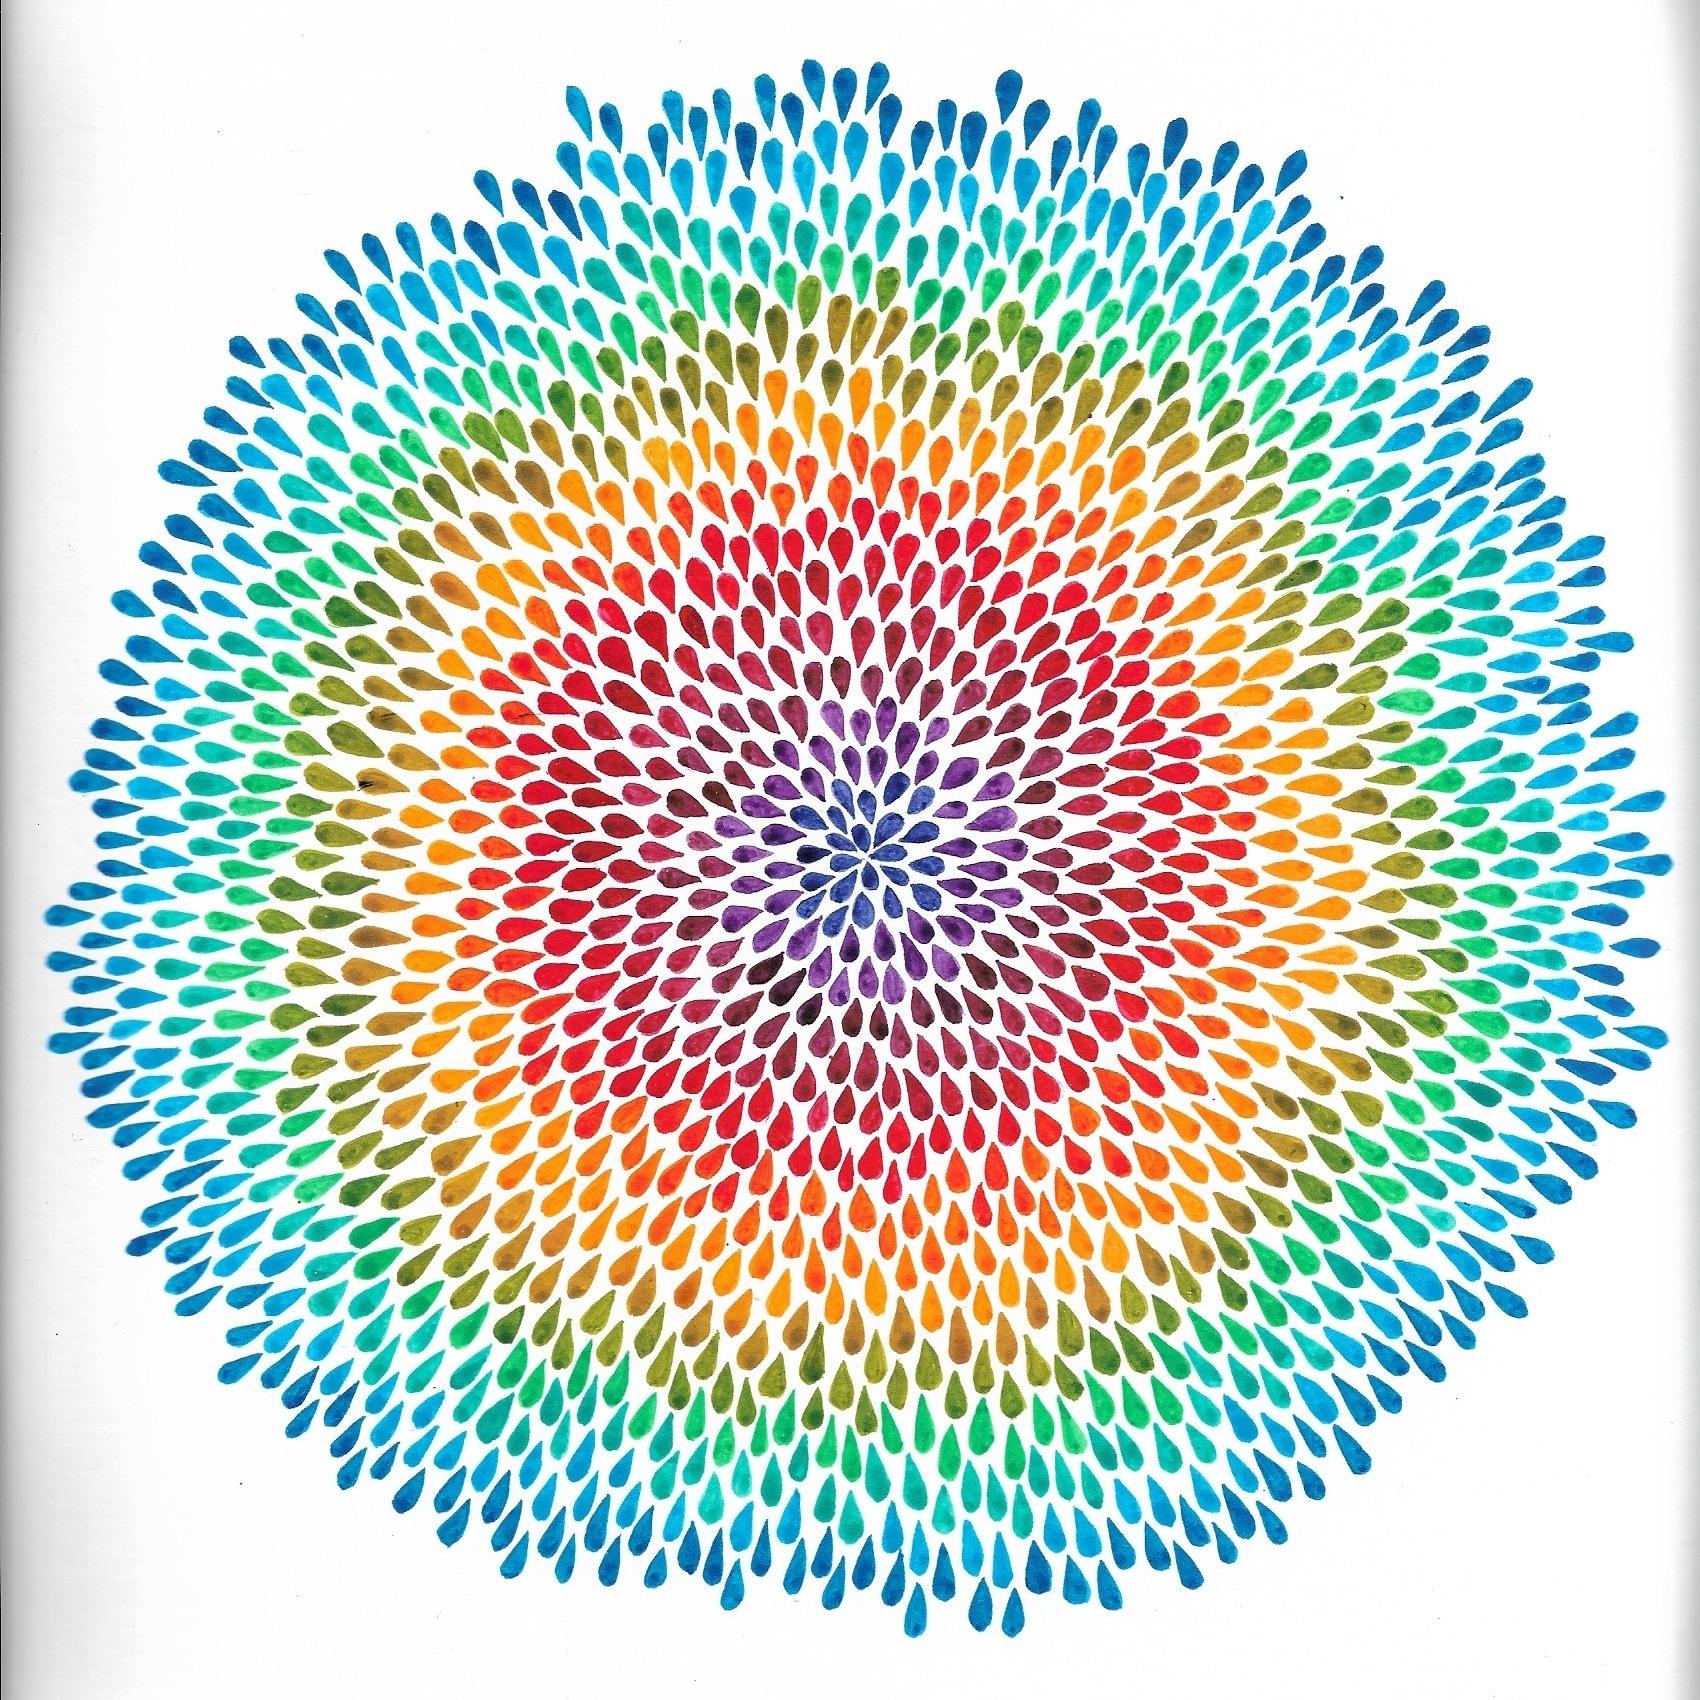 Rainbow Drops 180213.jpg